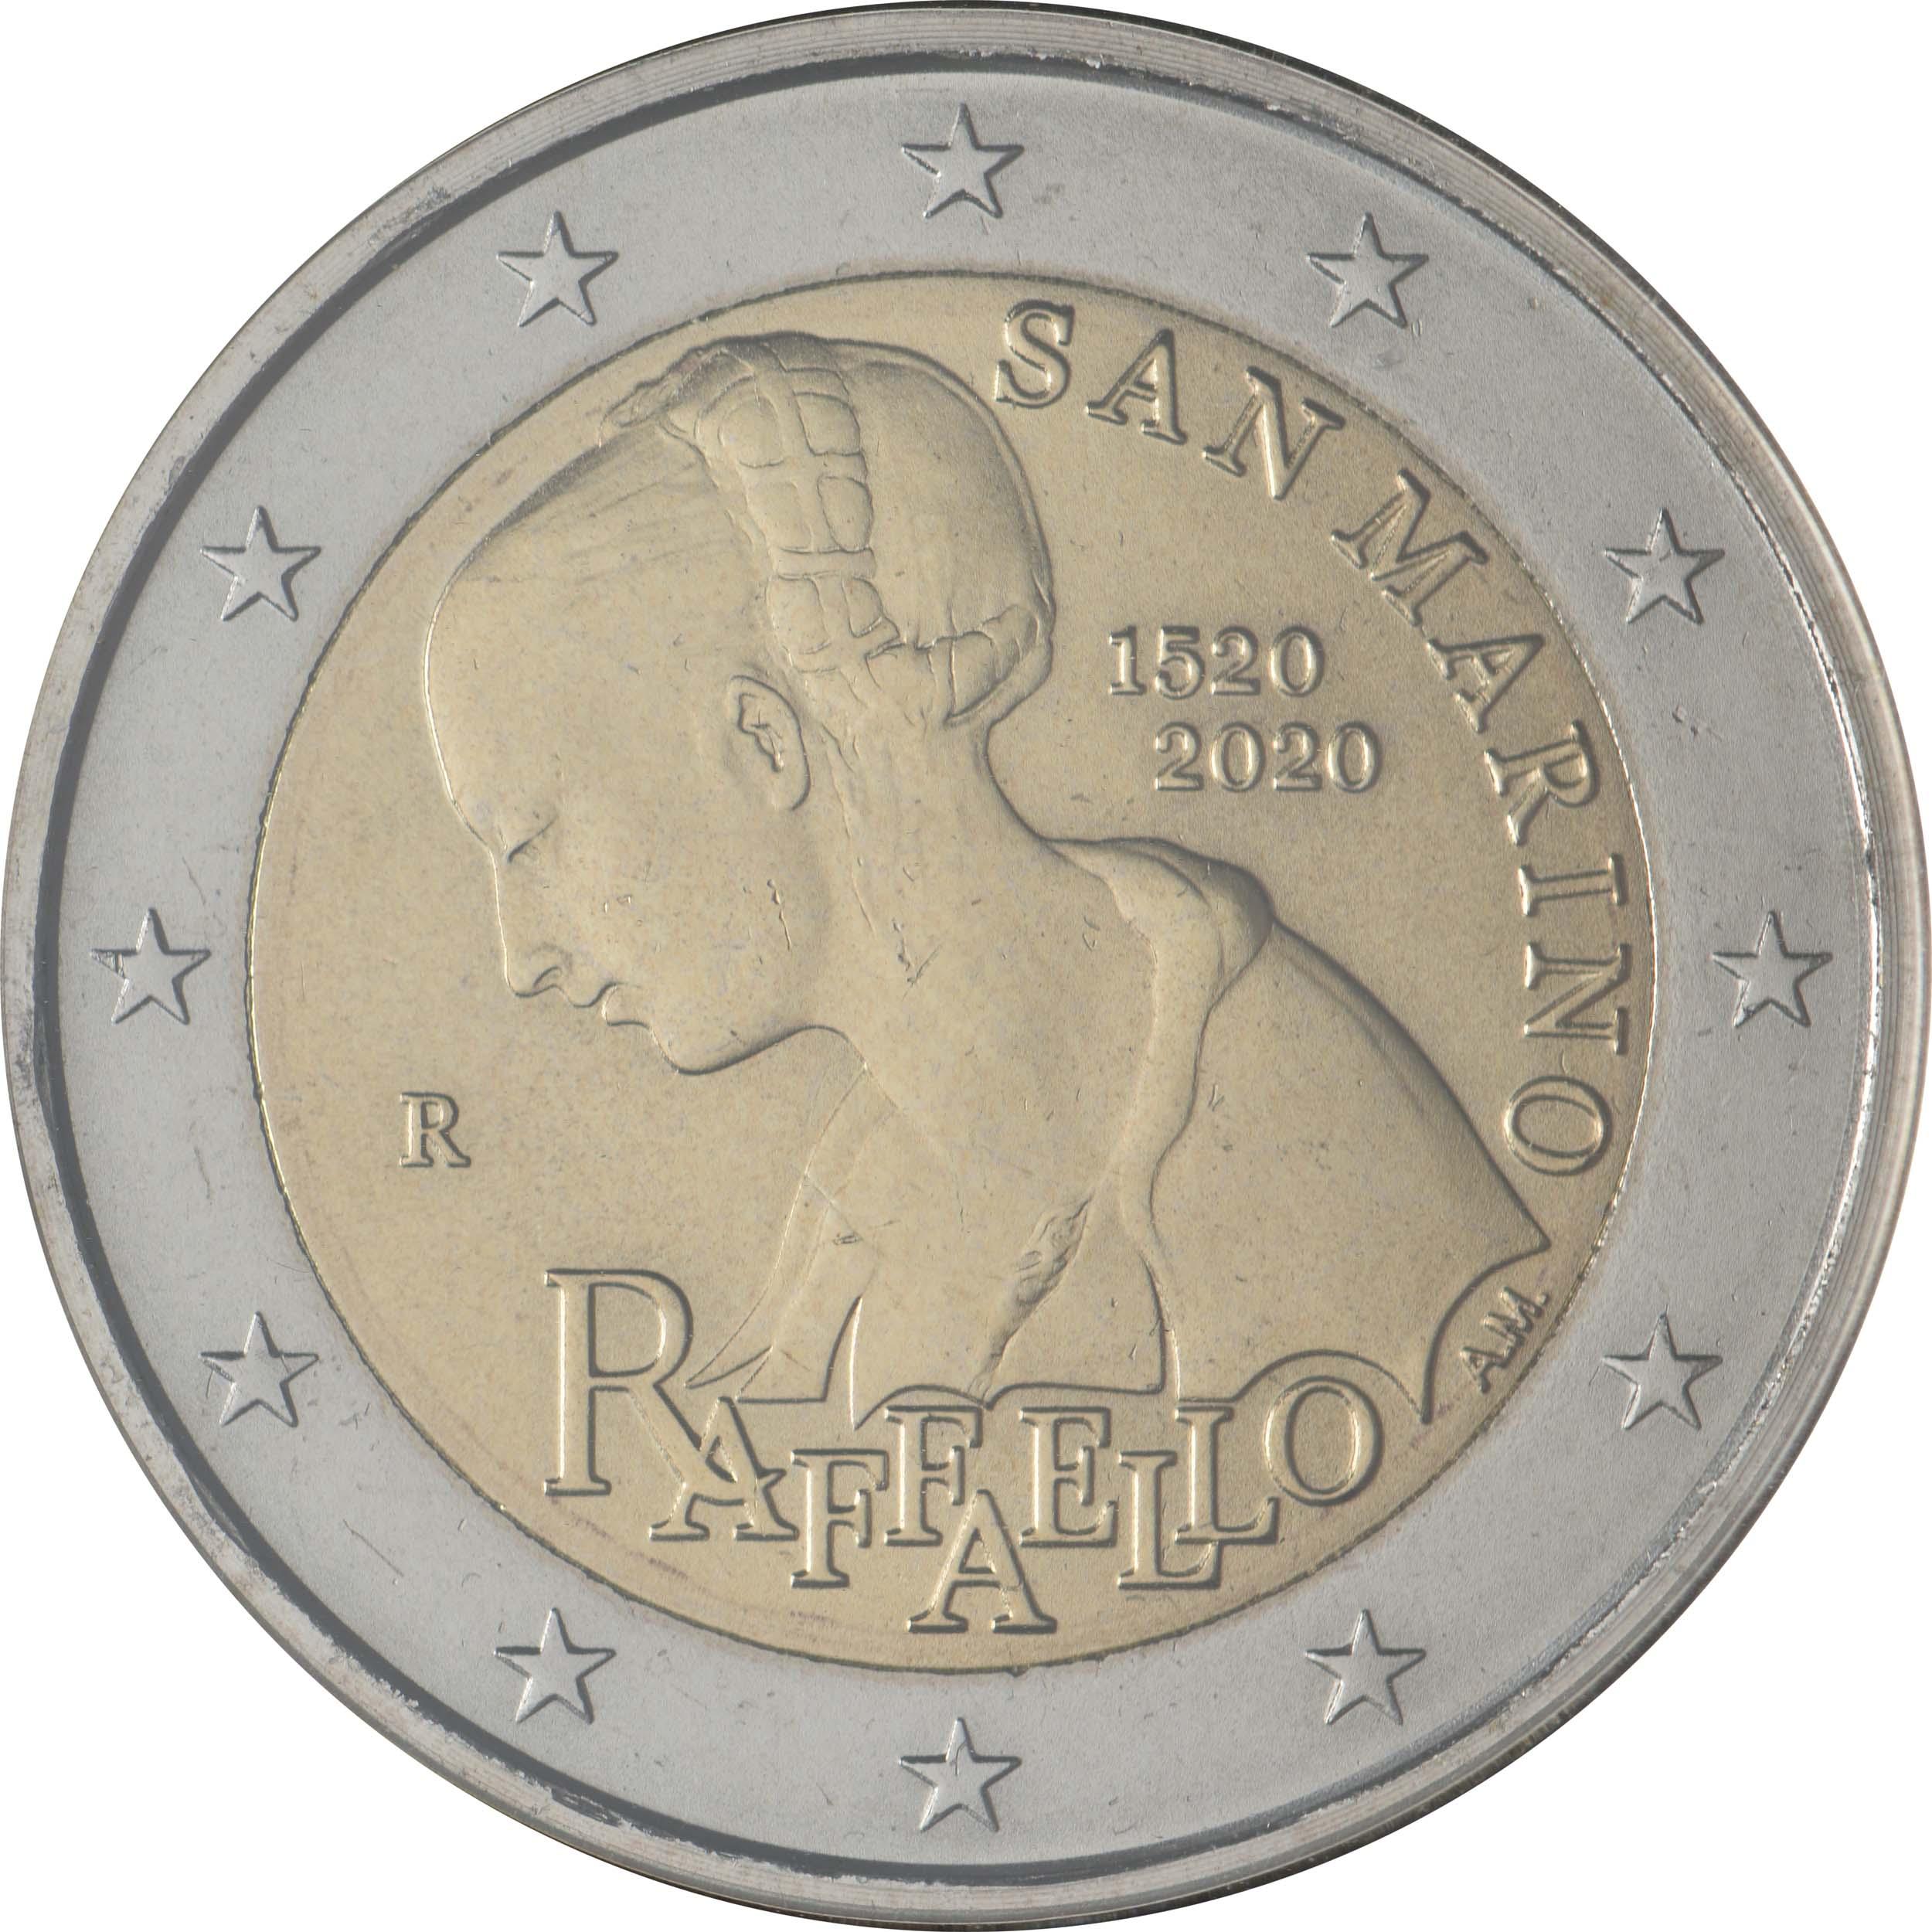 2020 372 San Marino Raffaelo.jpg